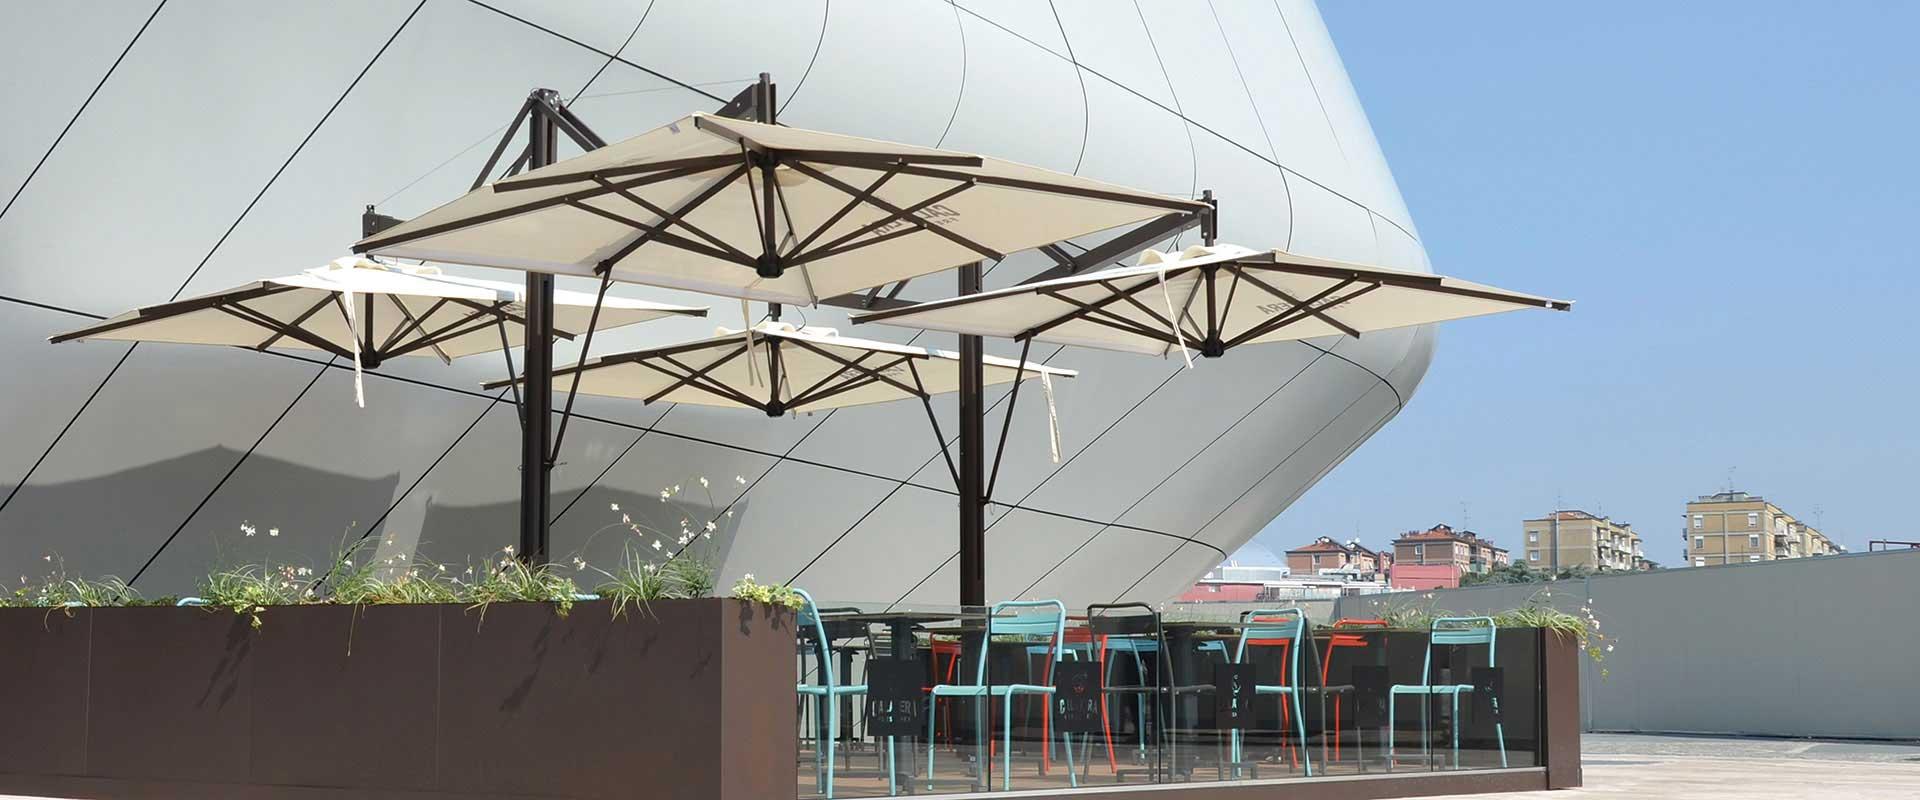 ombrelloni in zona urbana